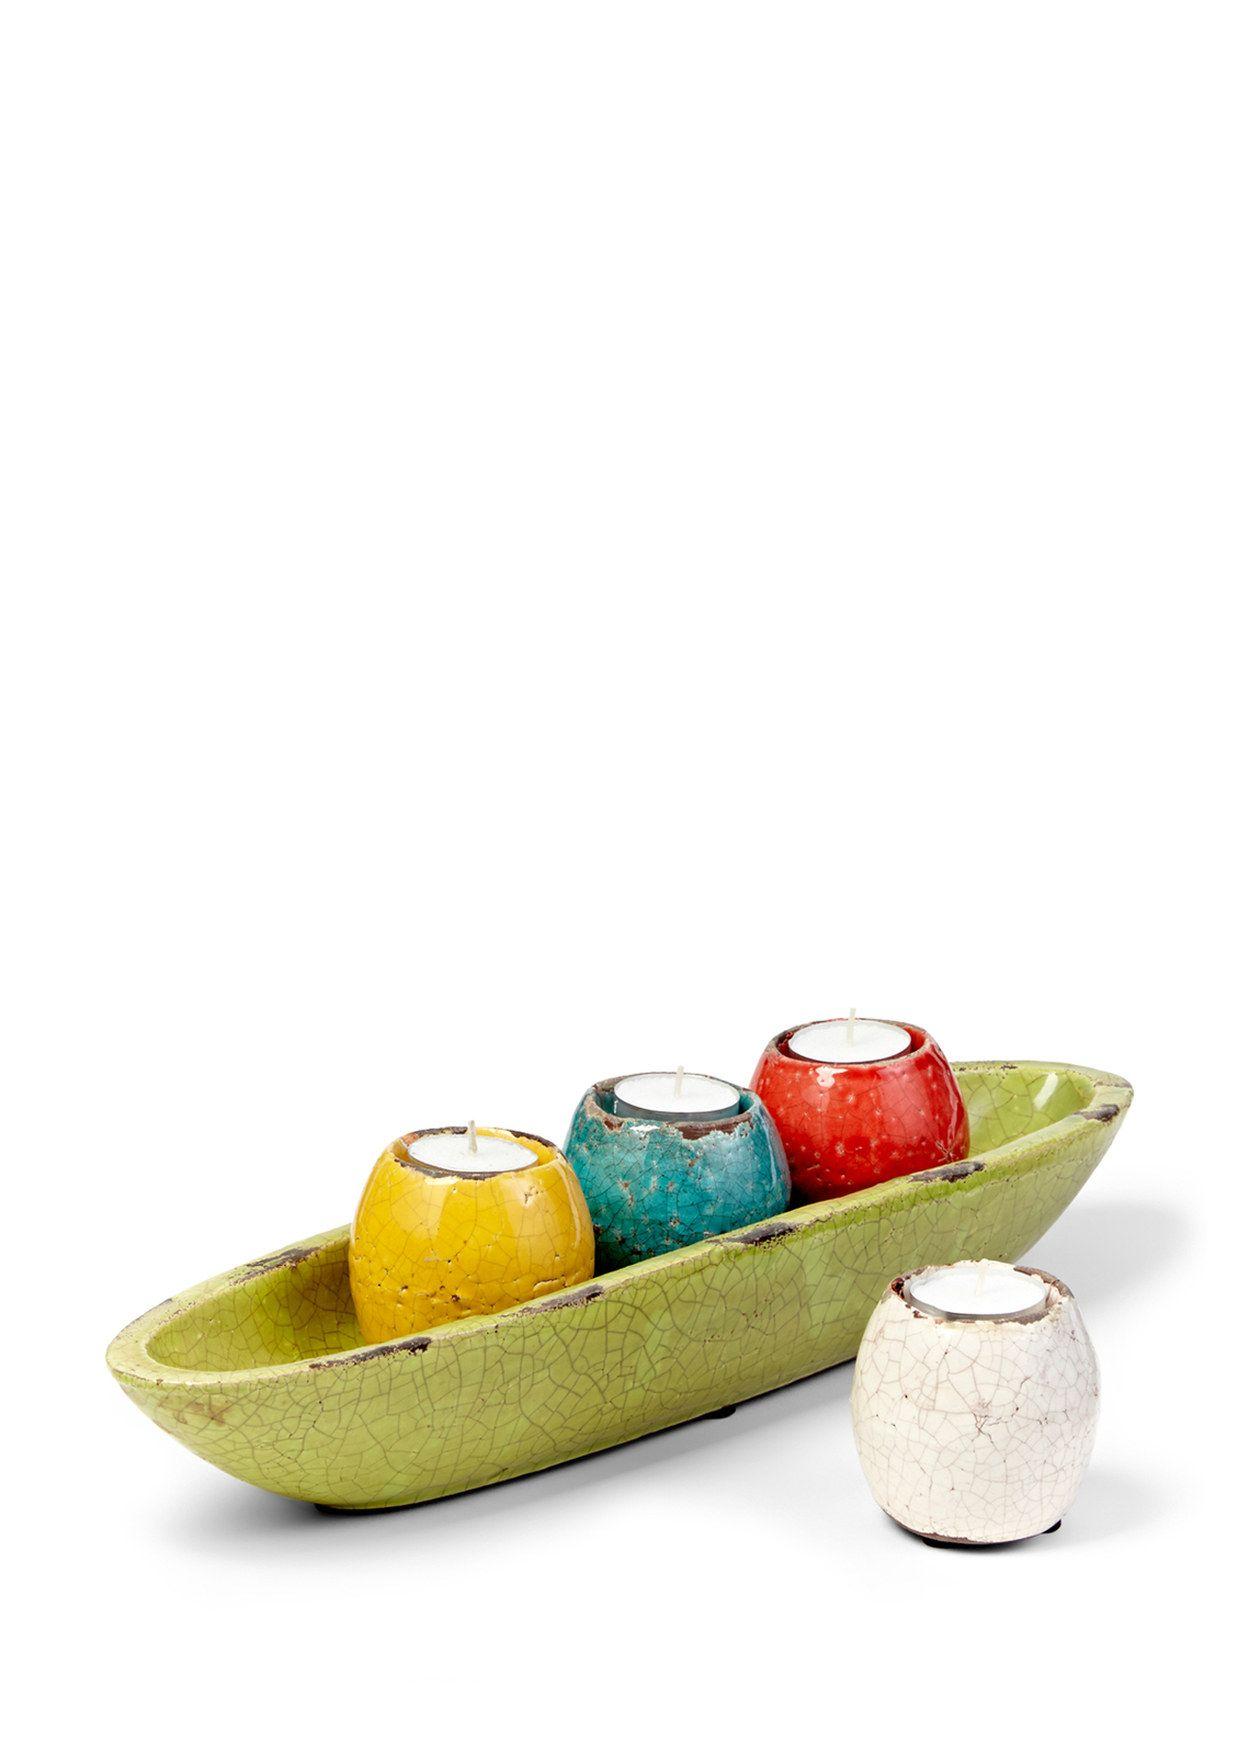 Ideeli imax set of mercade tealight candle holders in tray